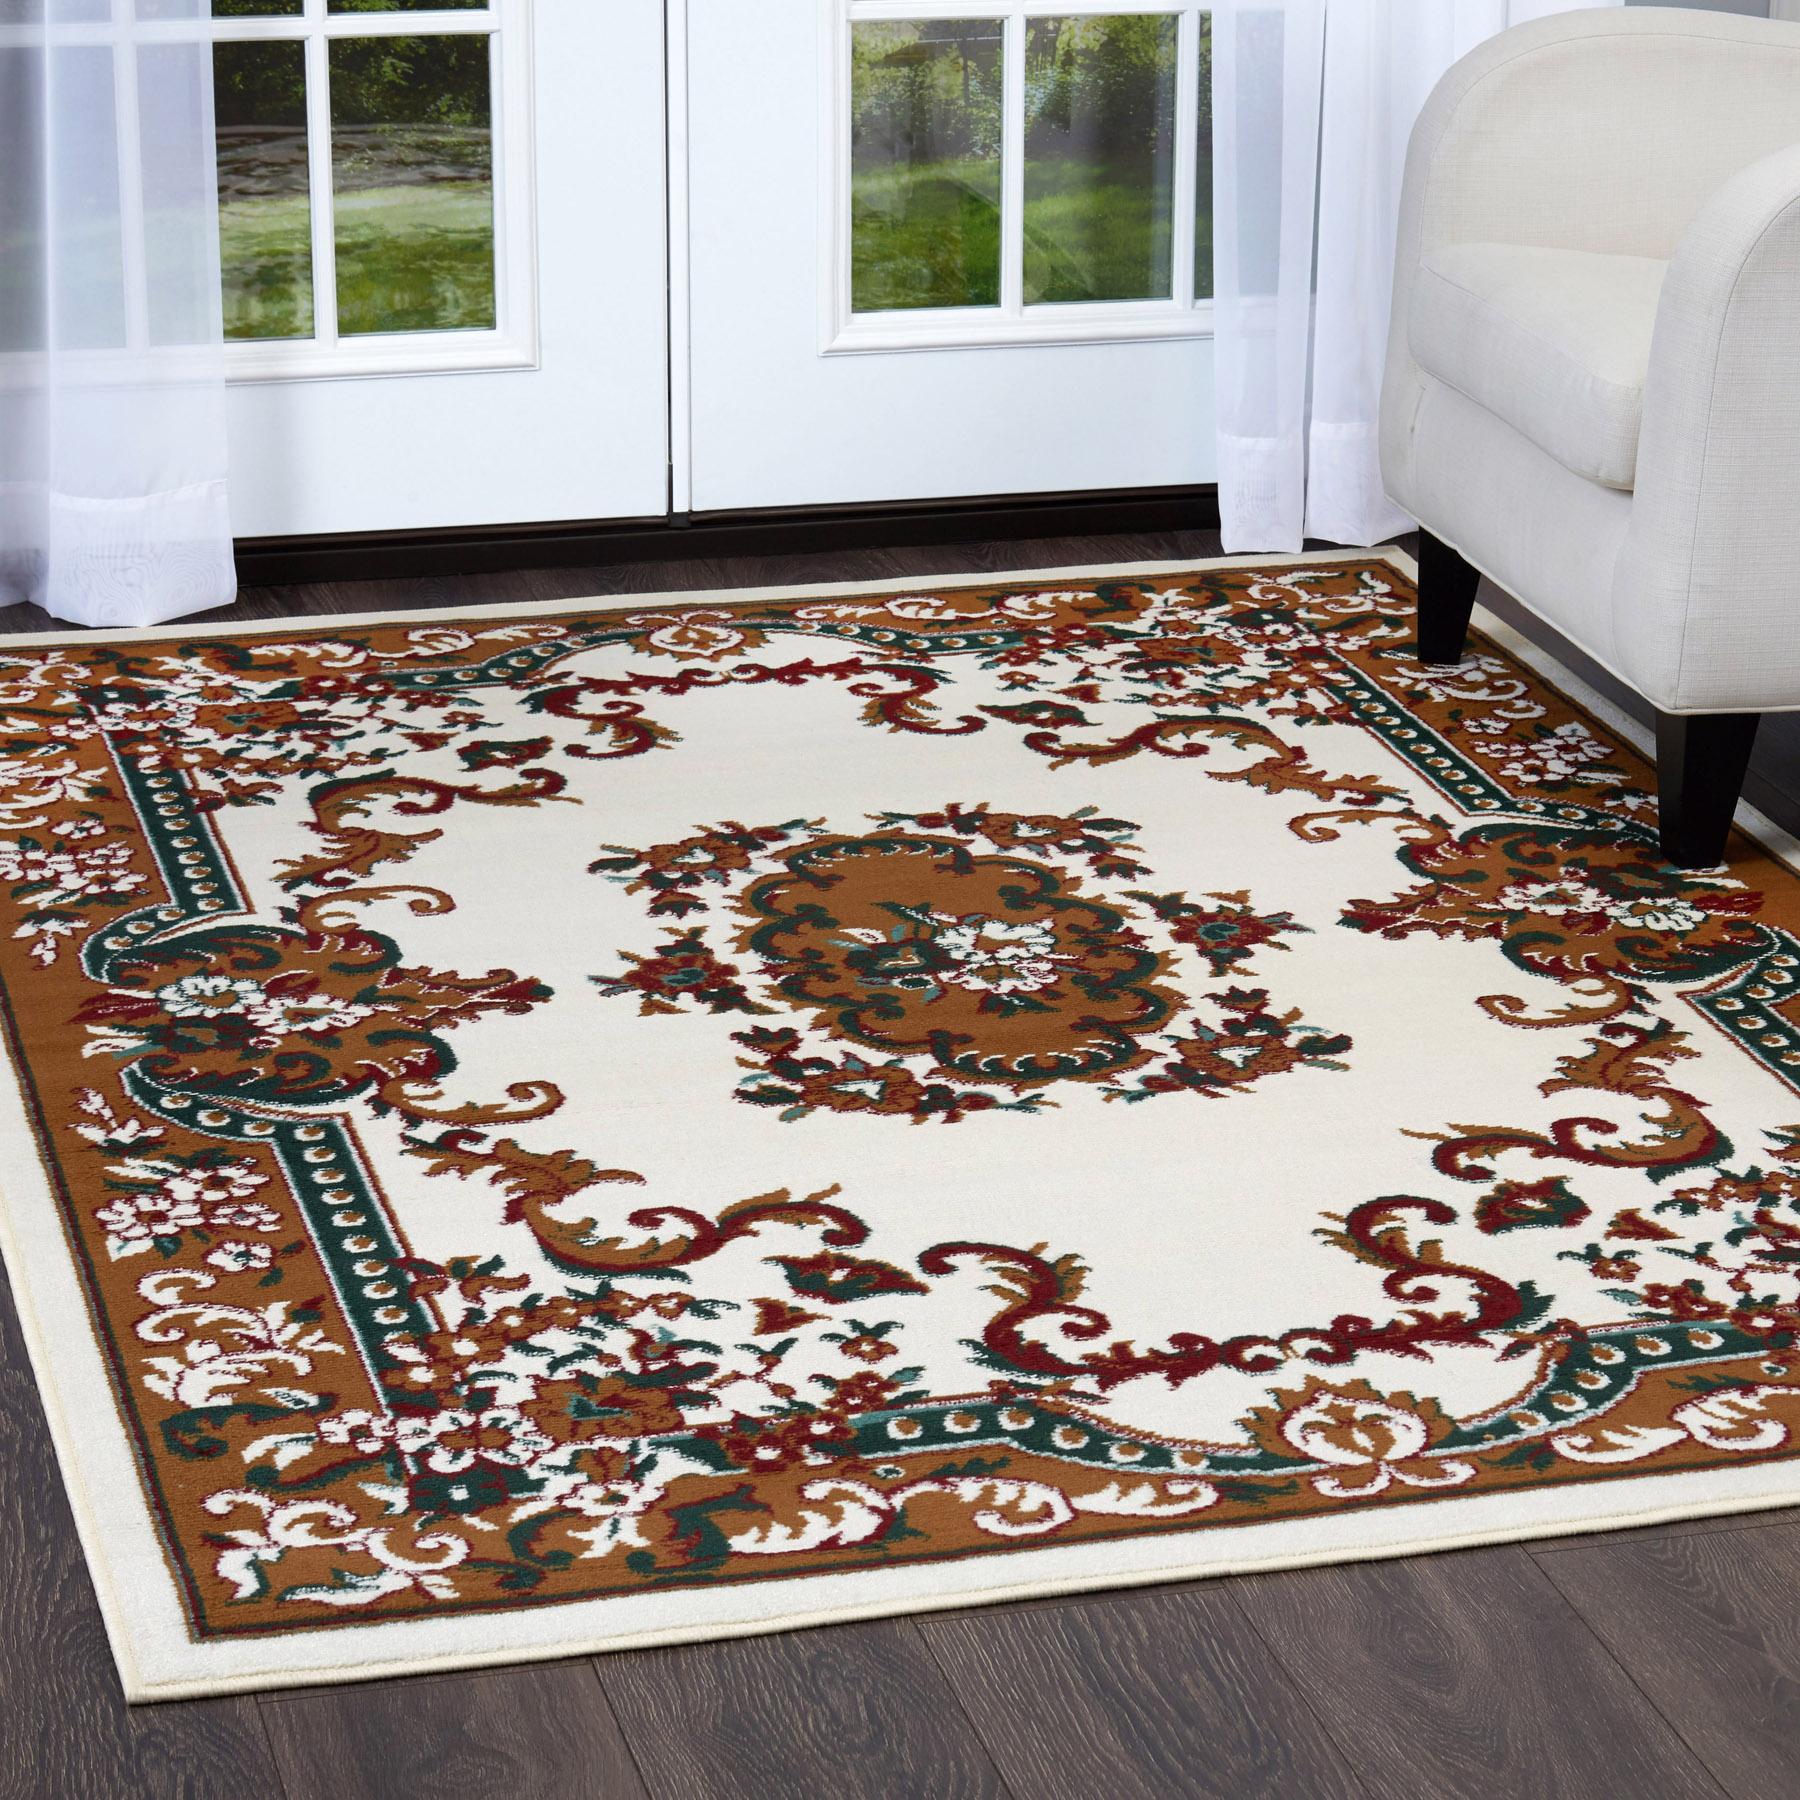 Oriental Cream Area Rug 4 X 6 Small Persian Carpet 83 Actual 3 7